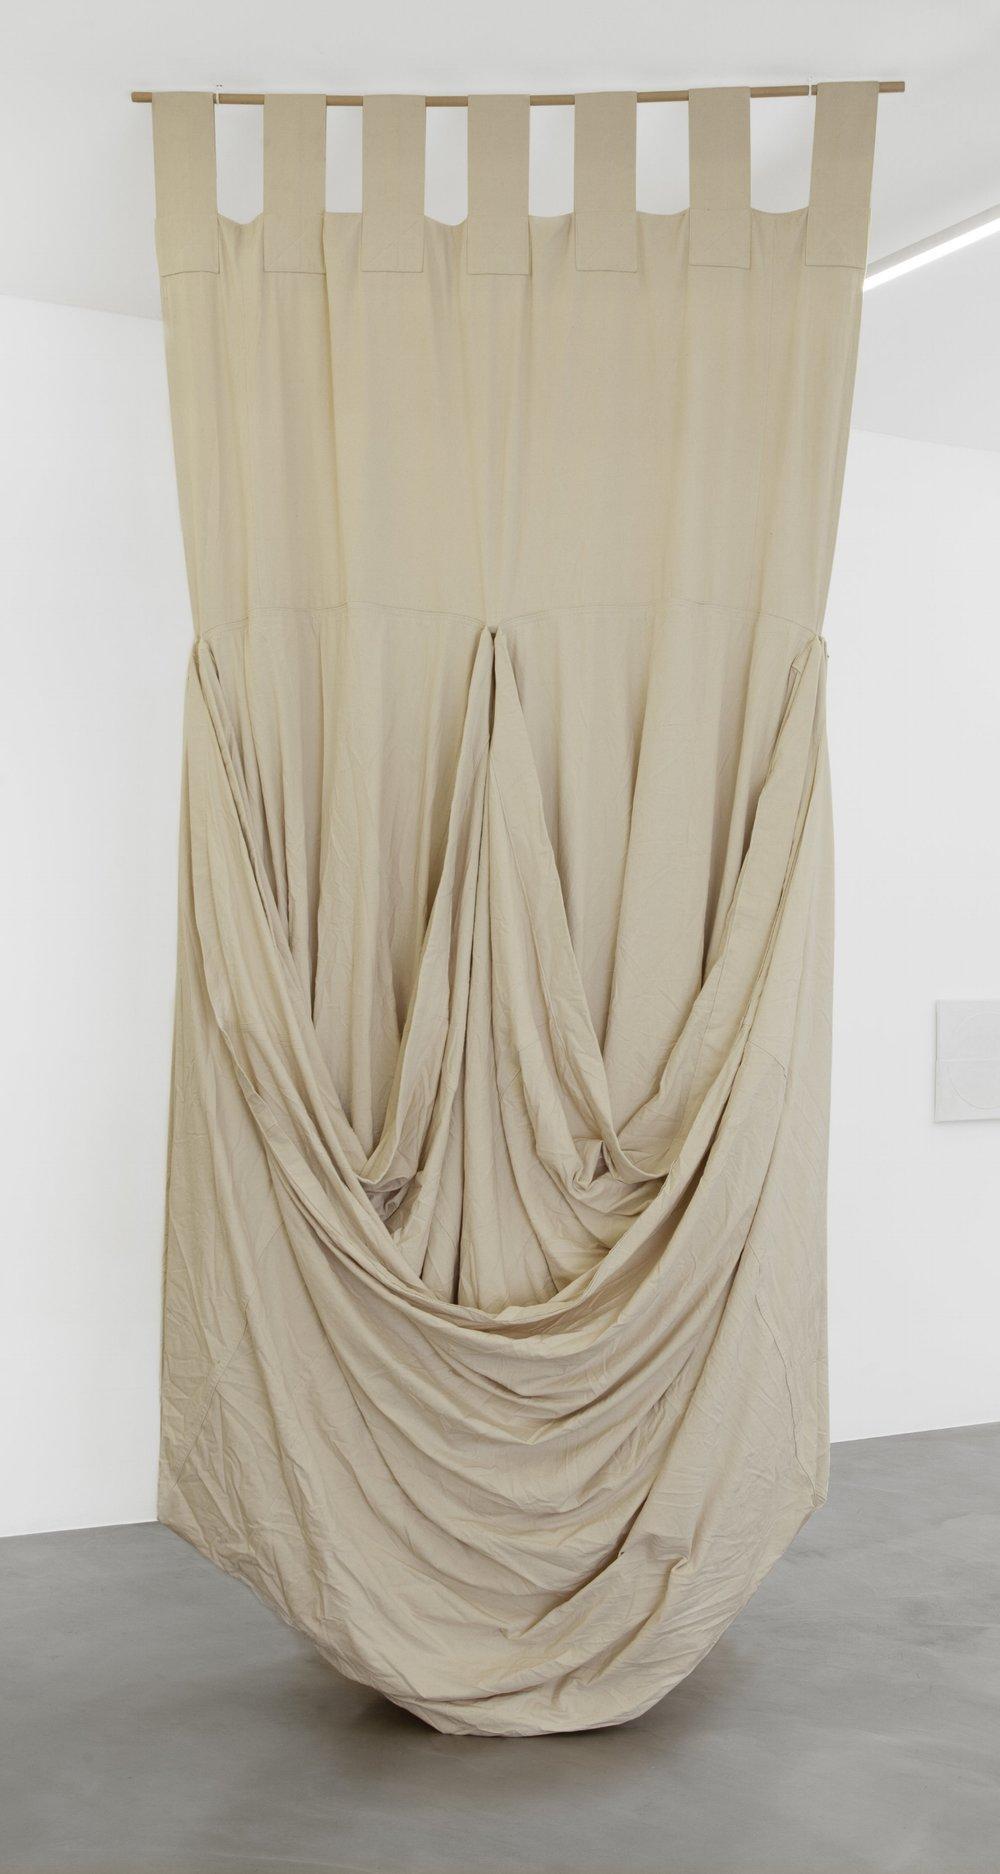 1985-5 , 1985 cotton, raw, 400 x 200 x 120 cm